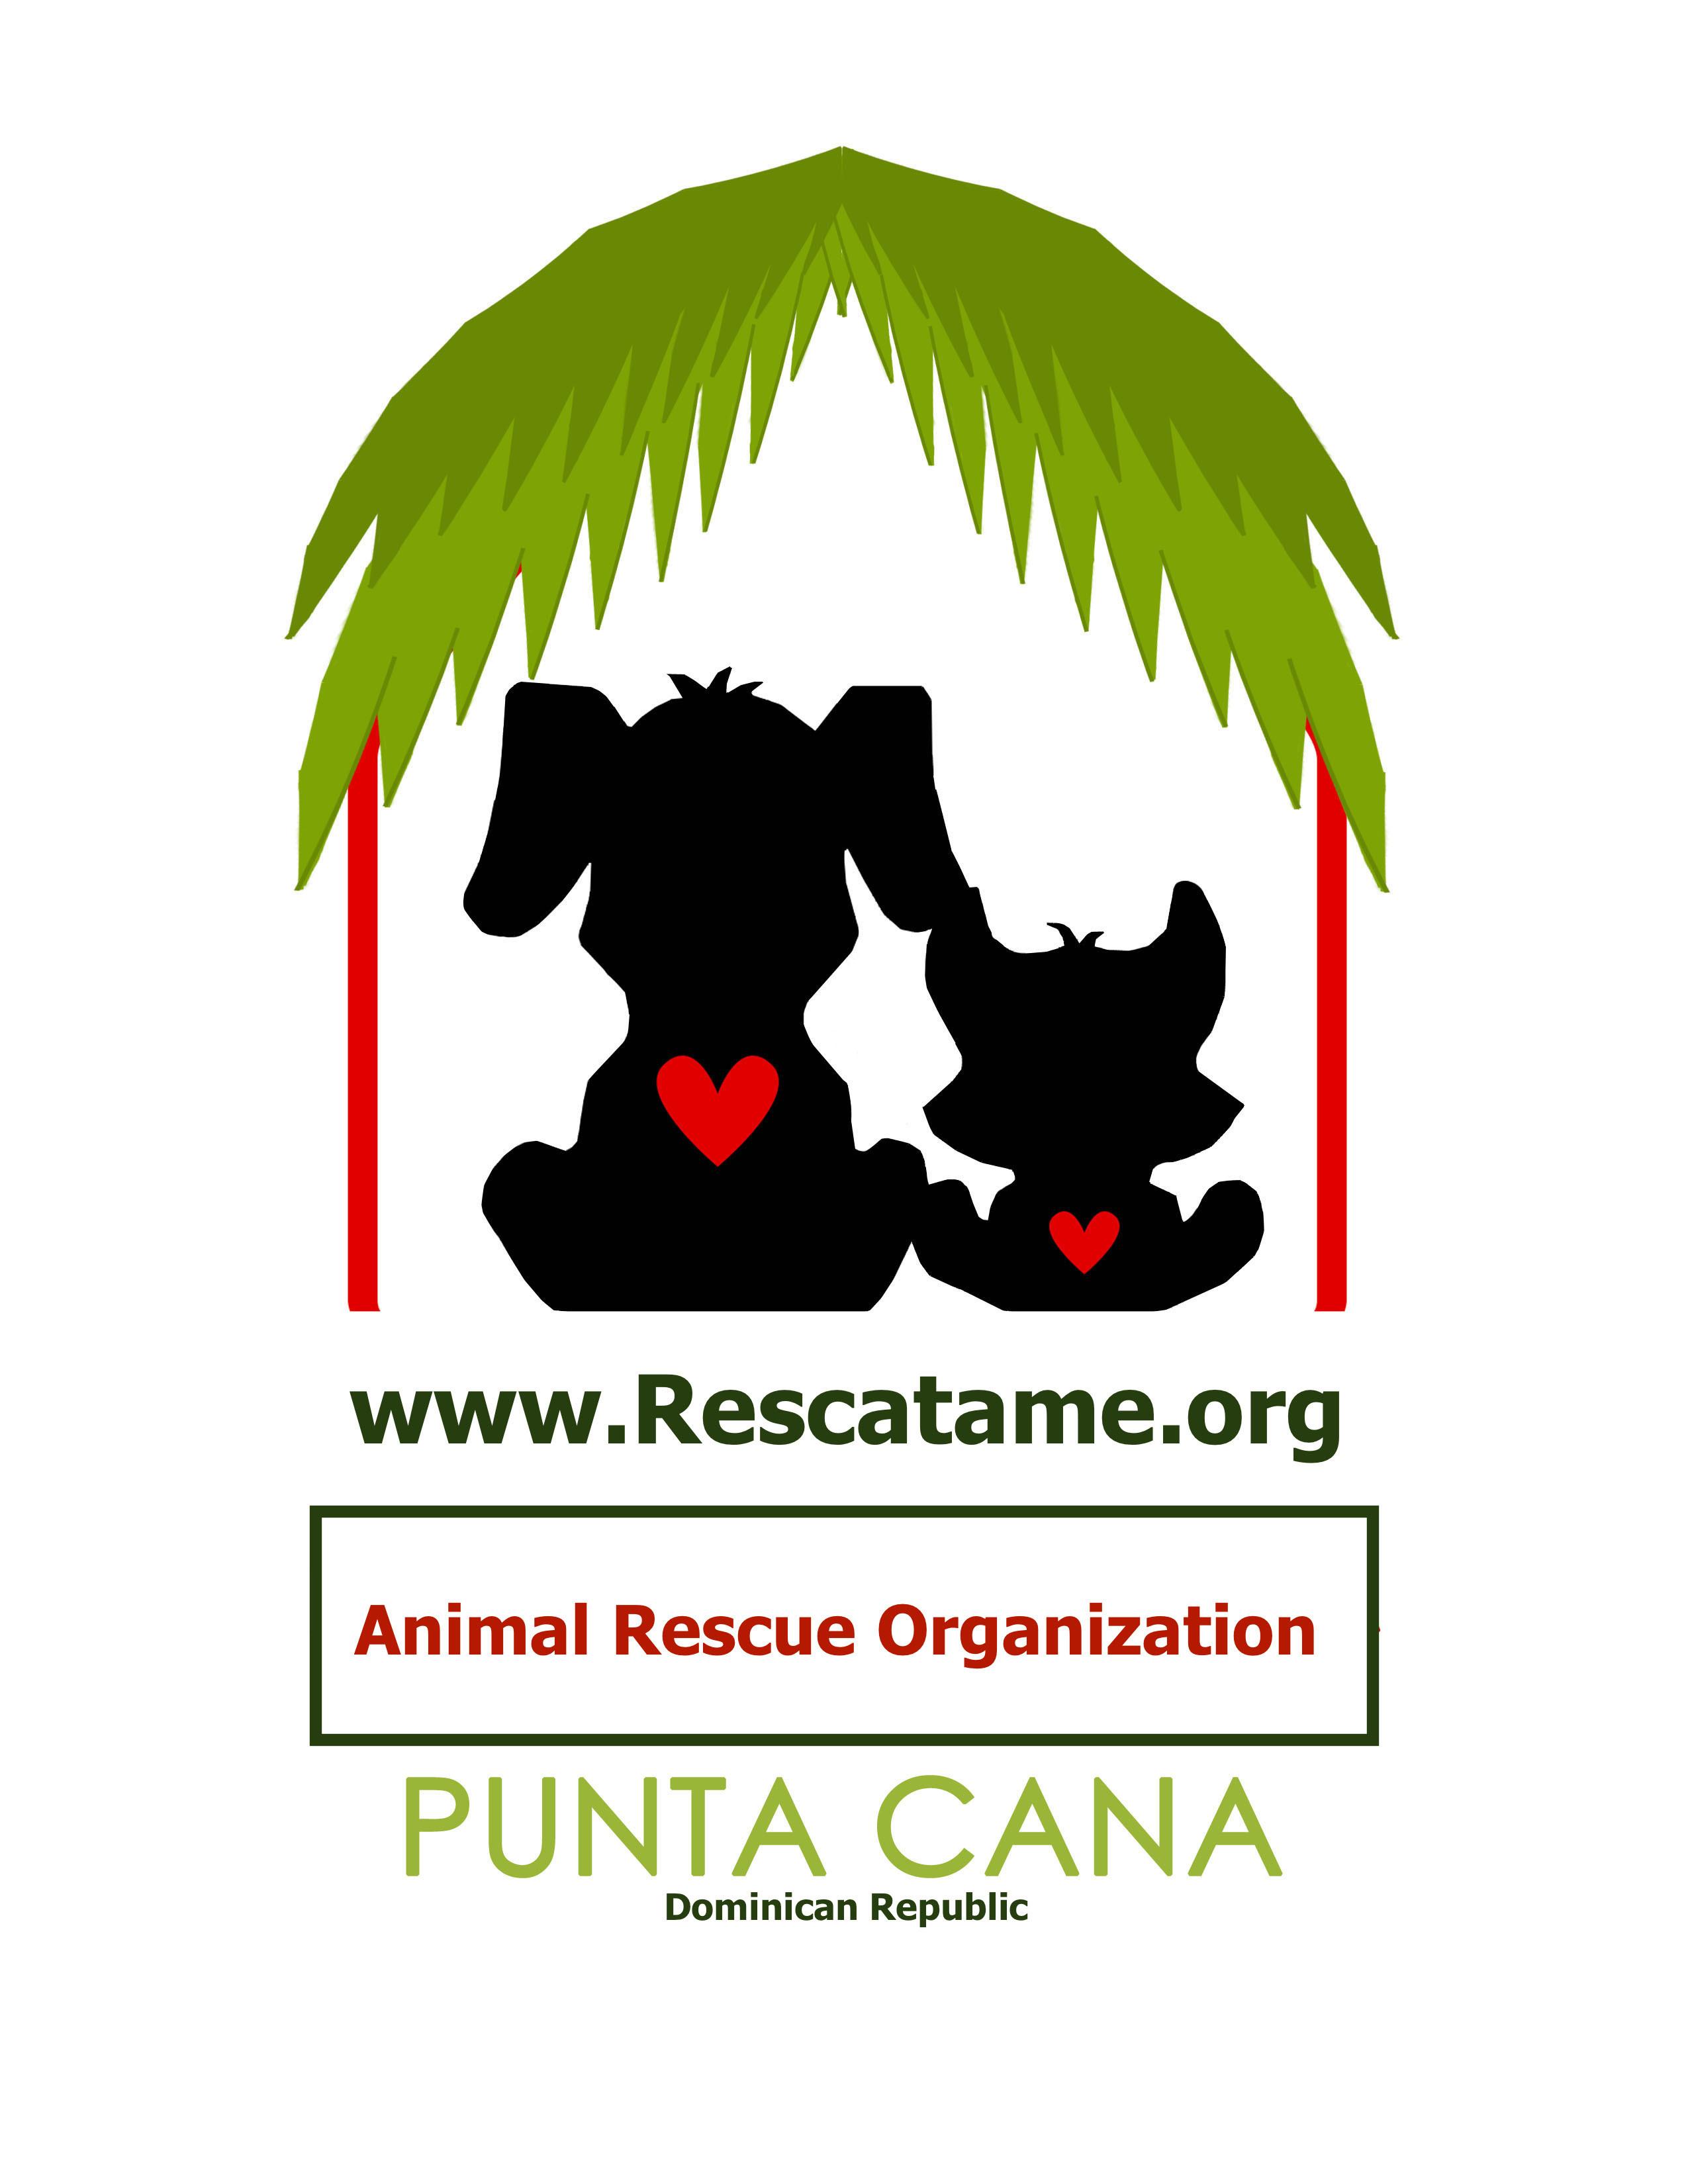 www.rescatame.org